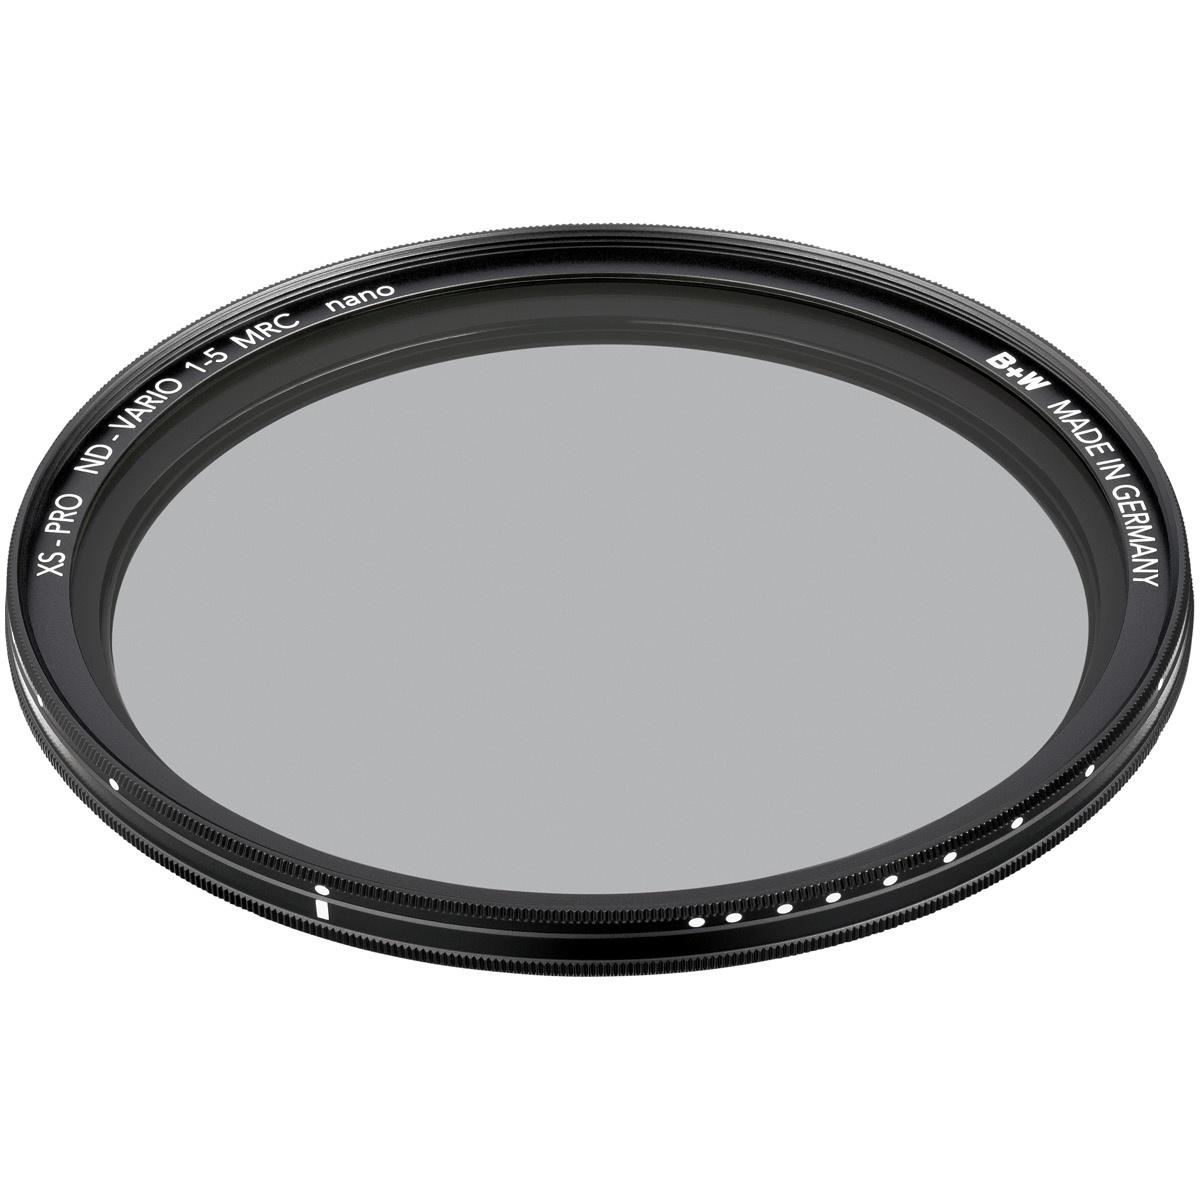 B+W Graufilter 58 mm XS-Pro Vario +1 -+5